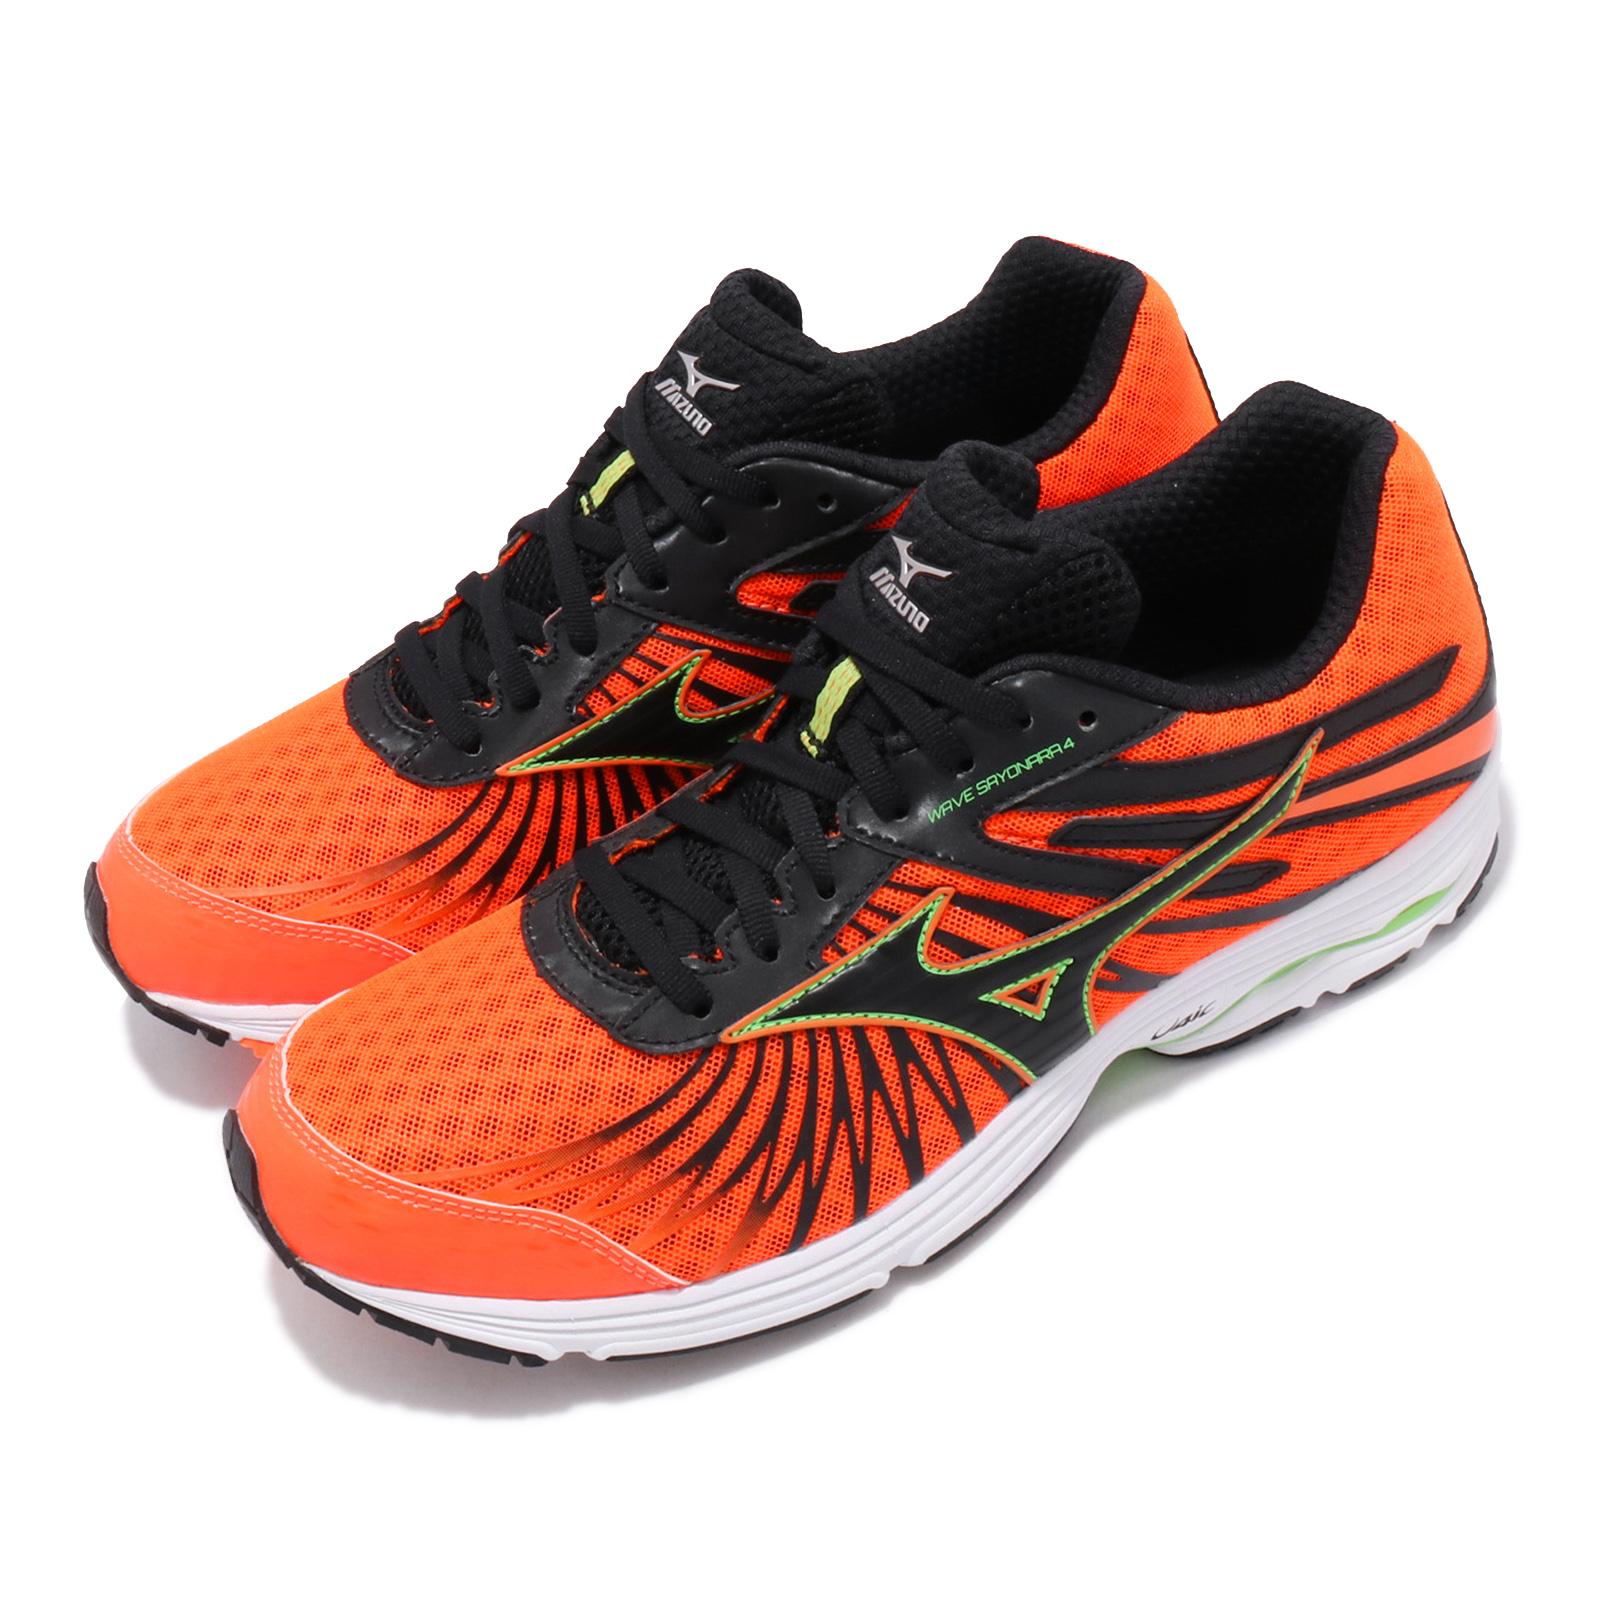 Mizuno 慢跑鞋 Wave Sayonara 4 男鞋 J1GC1630-09